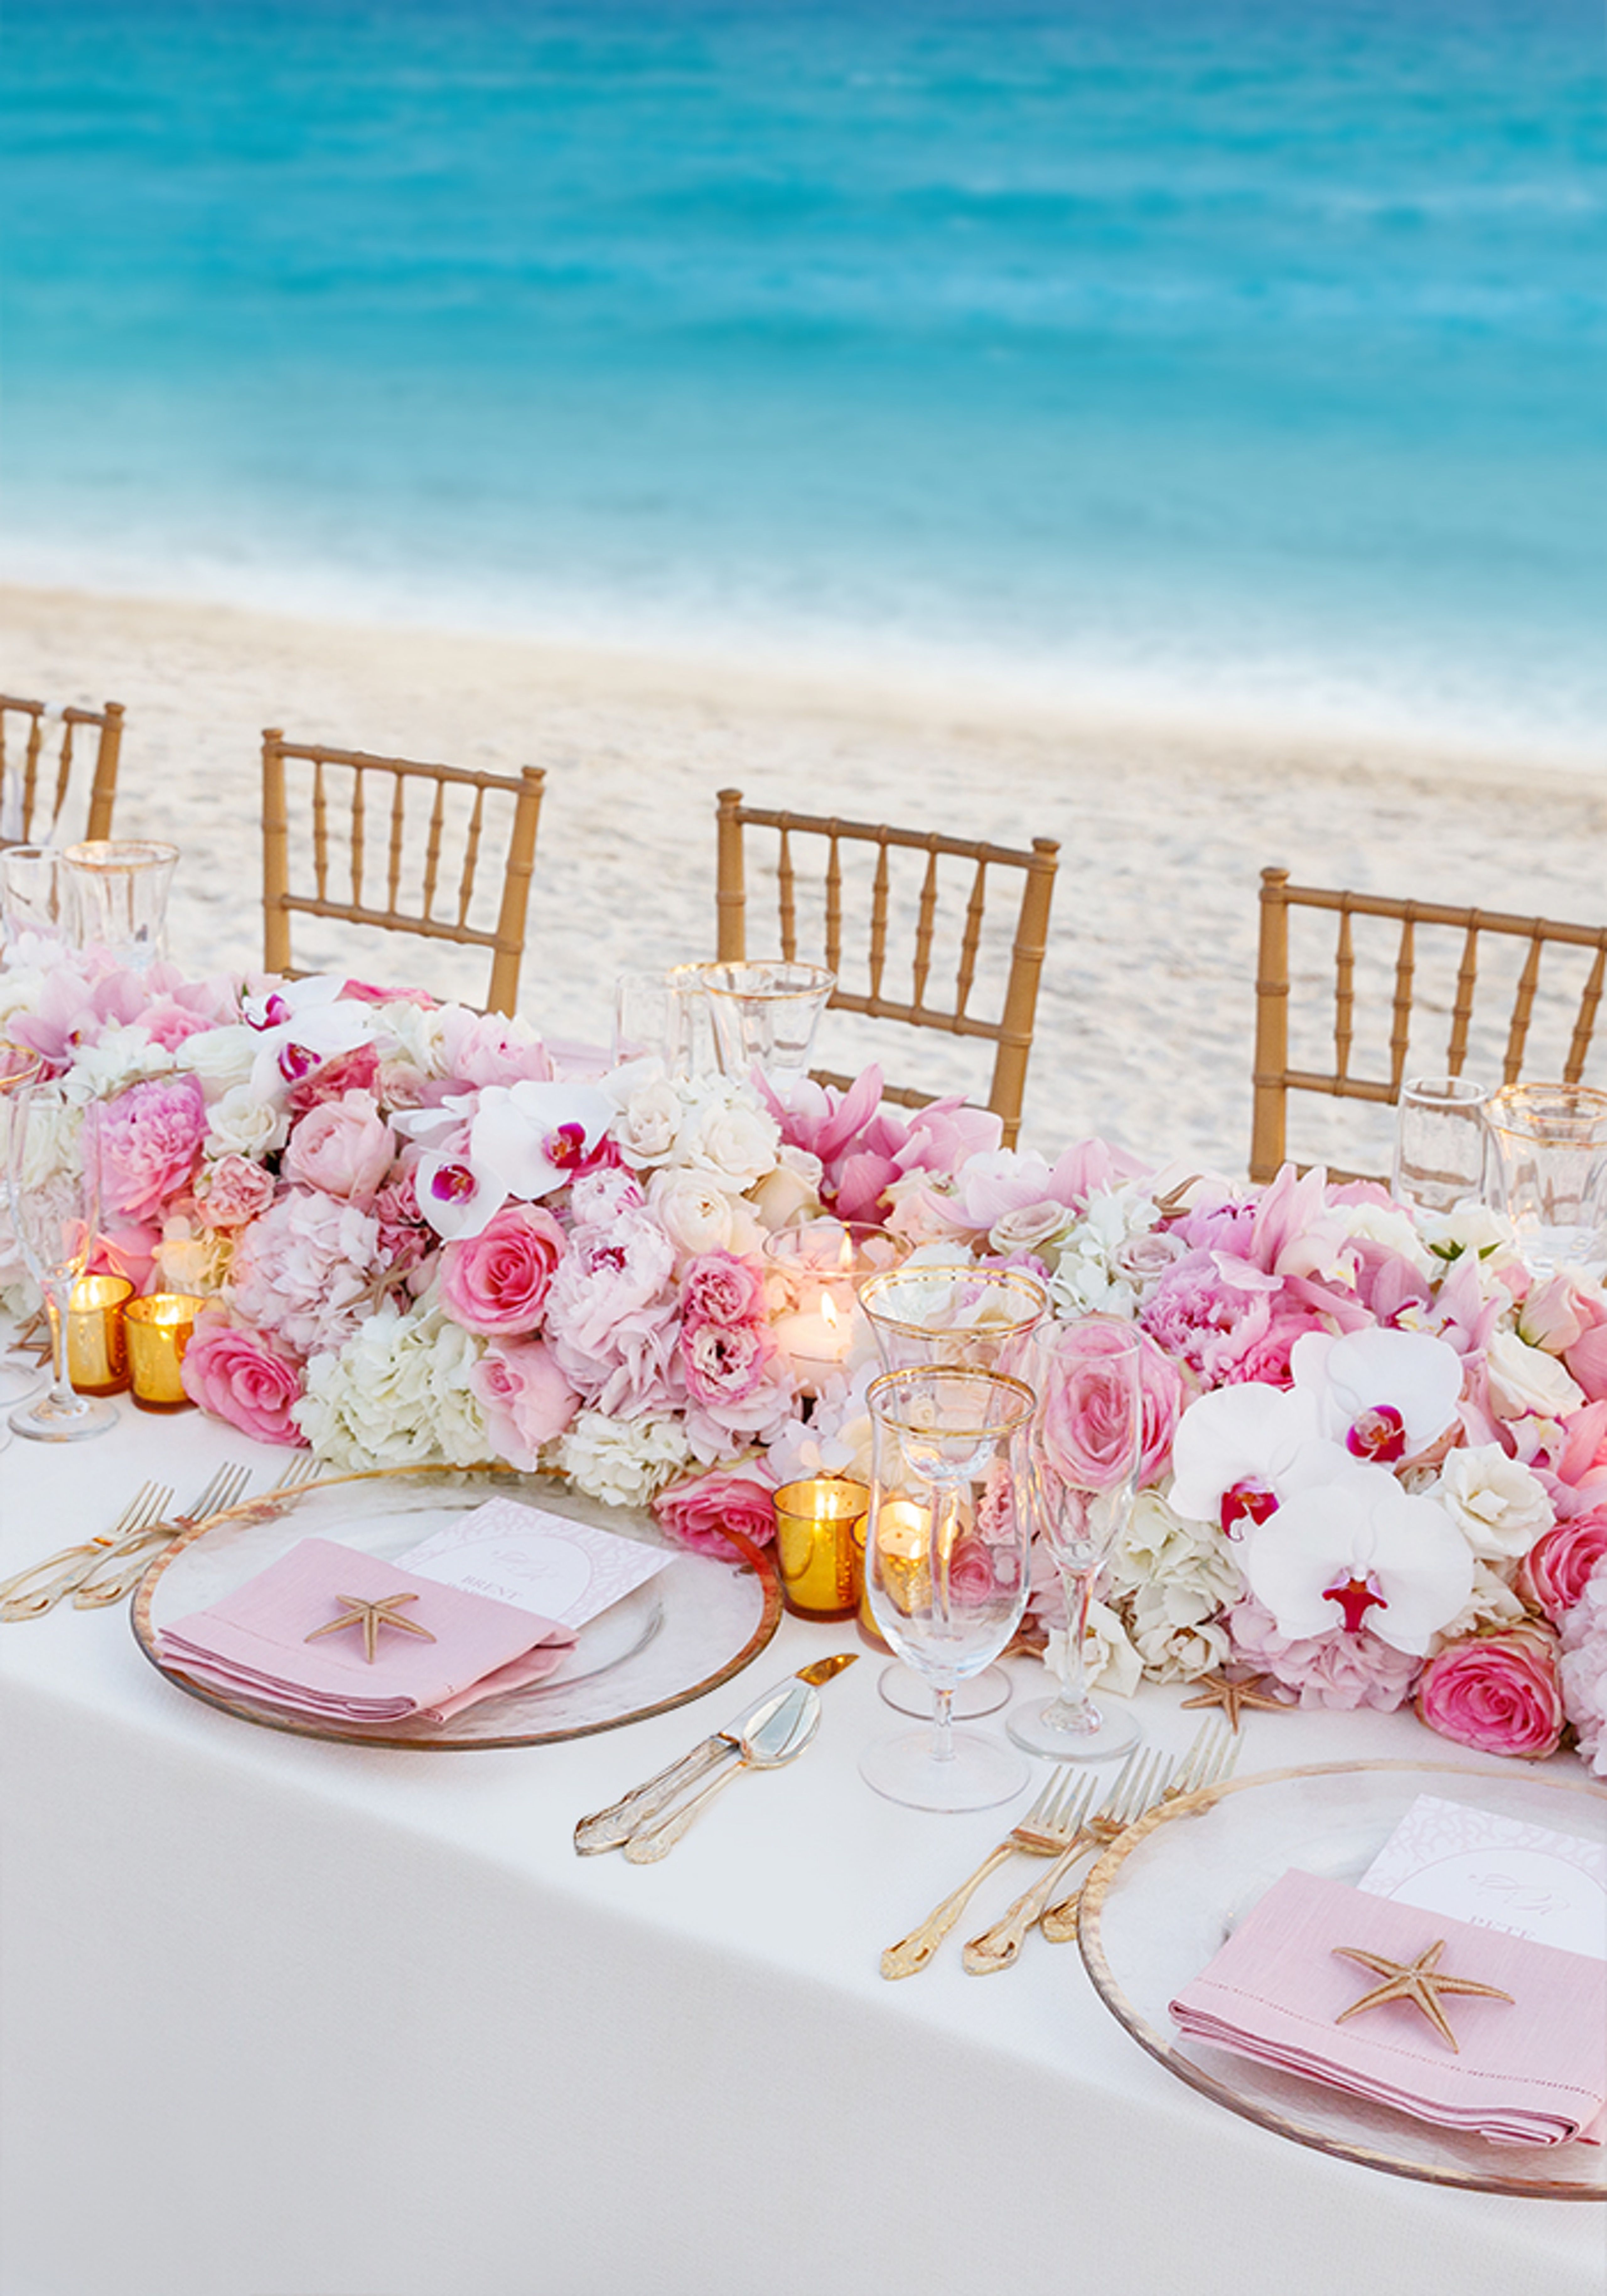 Colin Cowie Celebrations Romantic Caribbean Beach Wedding Beach Wedding Pink Beautiful Beach Wedding Beach Wedding Reception Tables